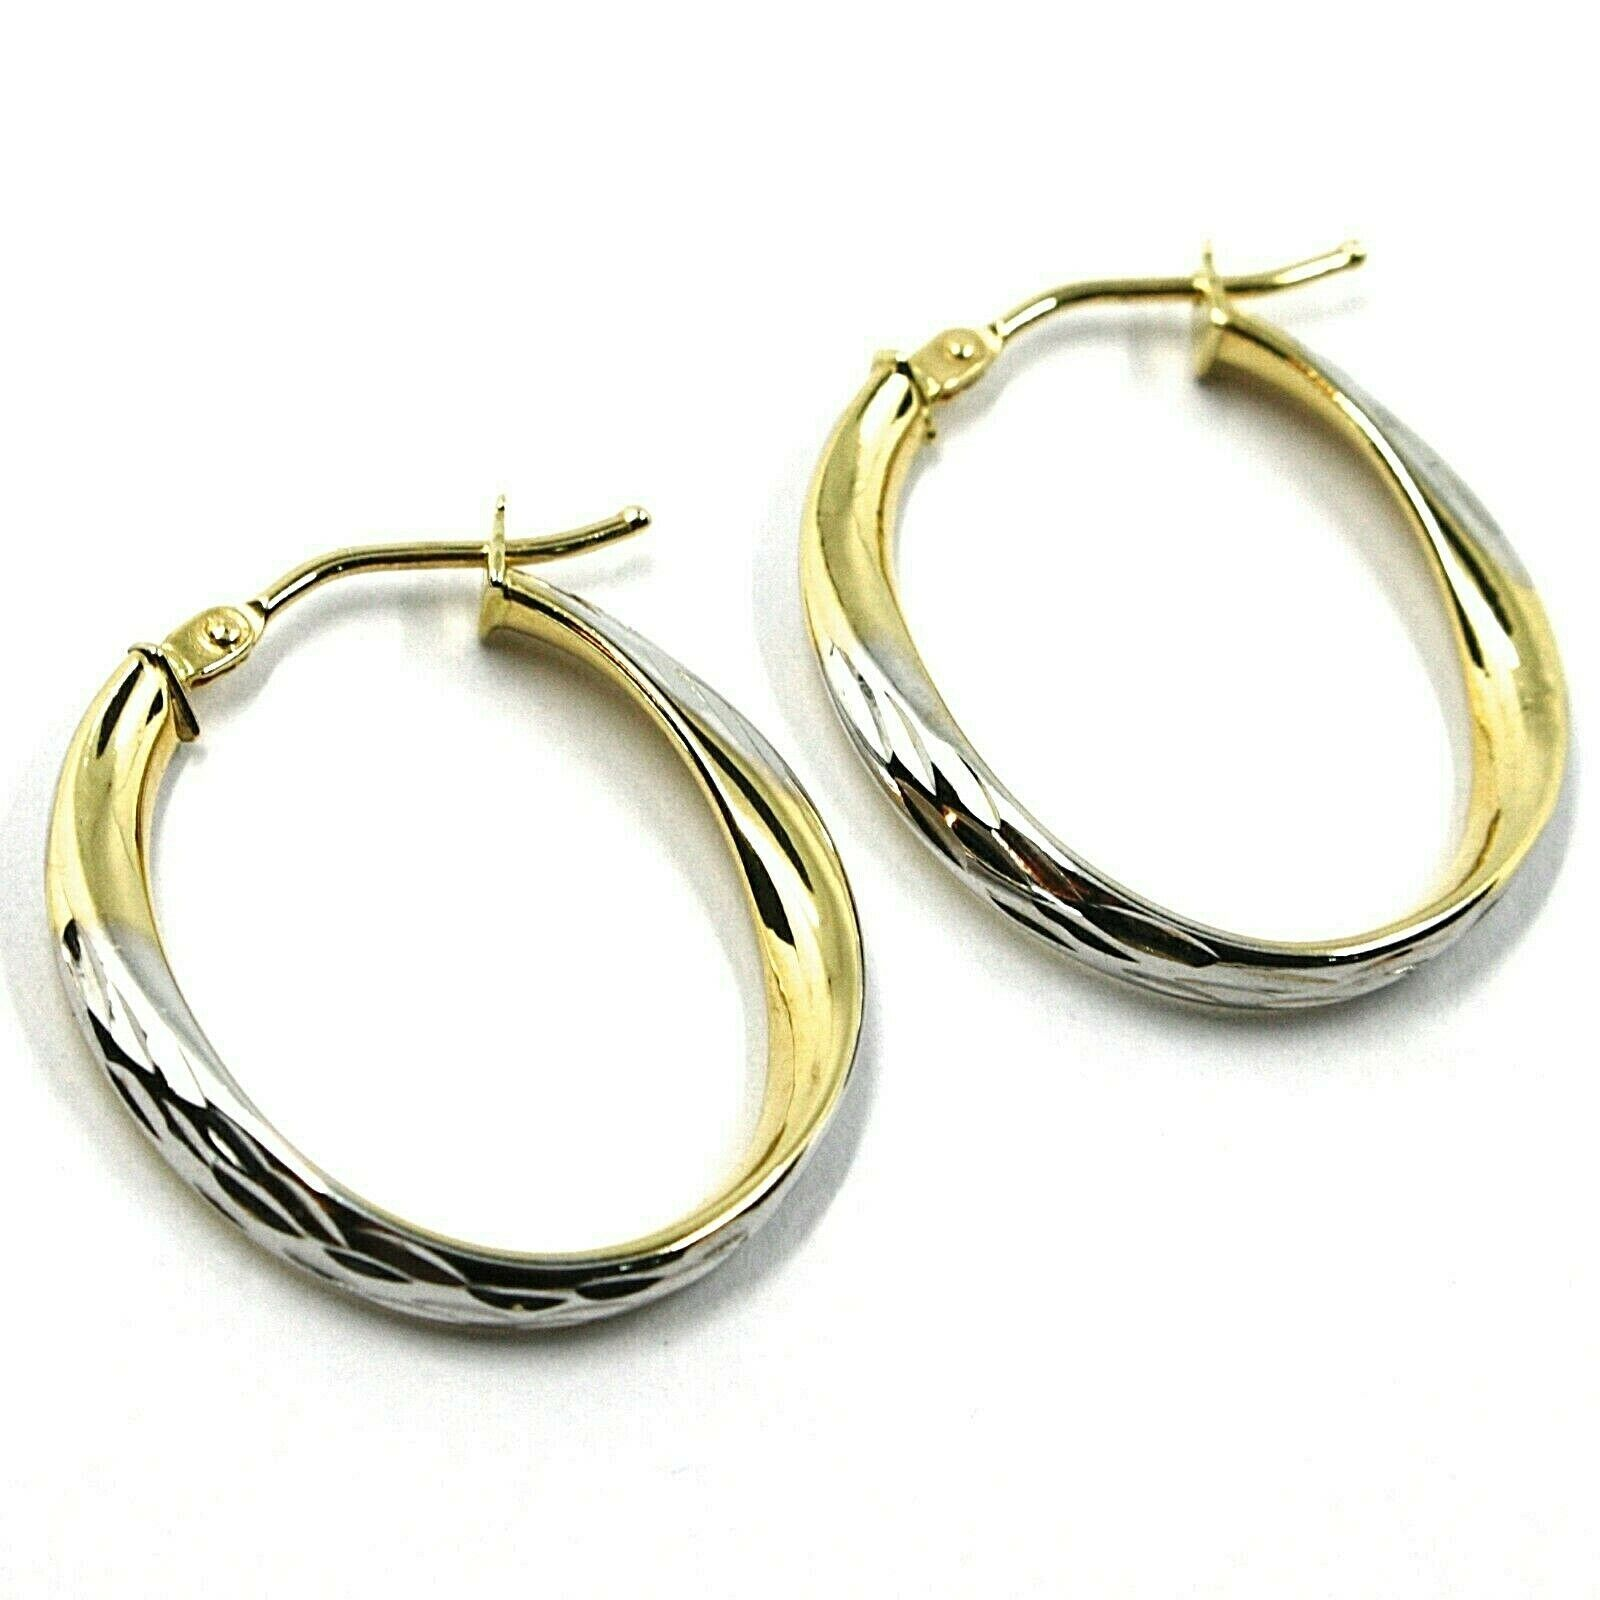 18K YELLOW WHITE GOLD OVAL CIRCLE HOOPS PENDANT EARRINGS, TWISTED 2.5cm ONDULATE